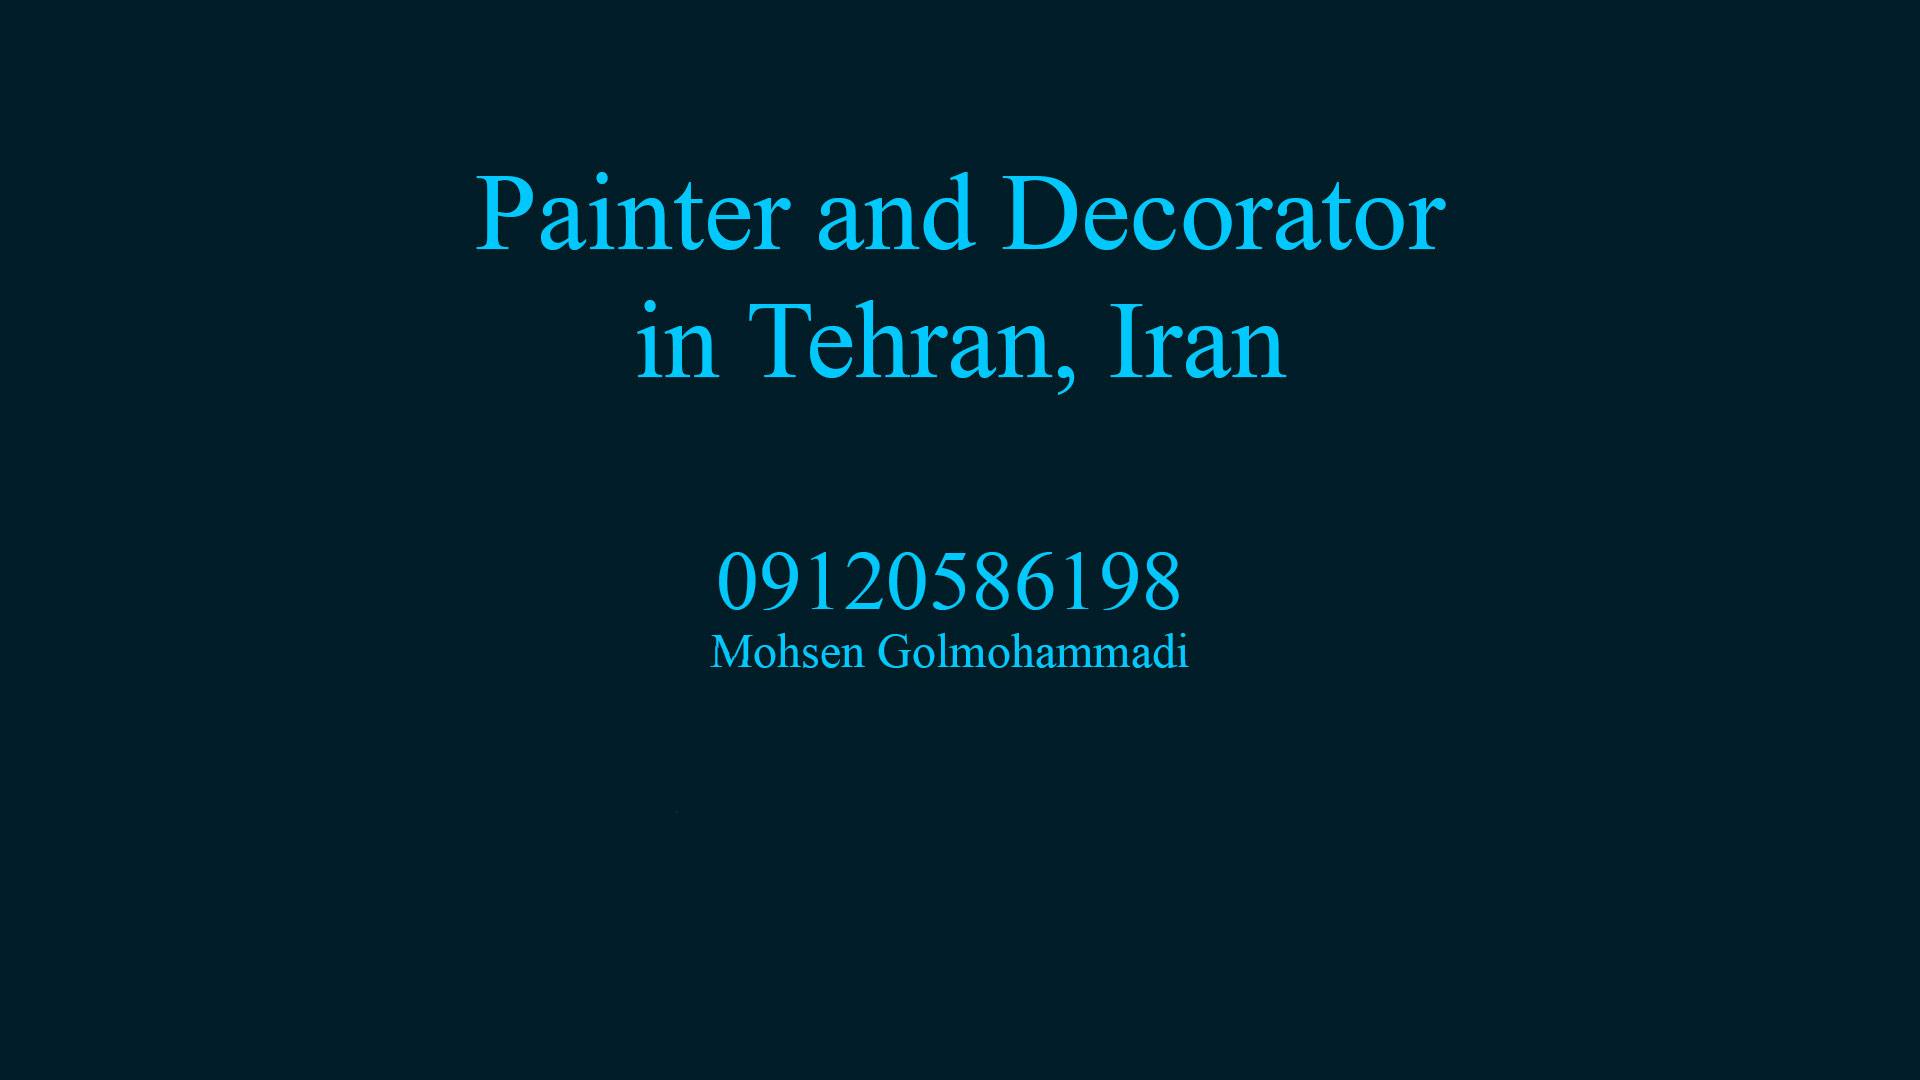 Painter and Decorator in tehran iran